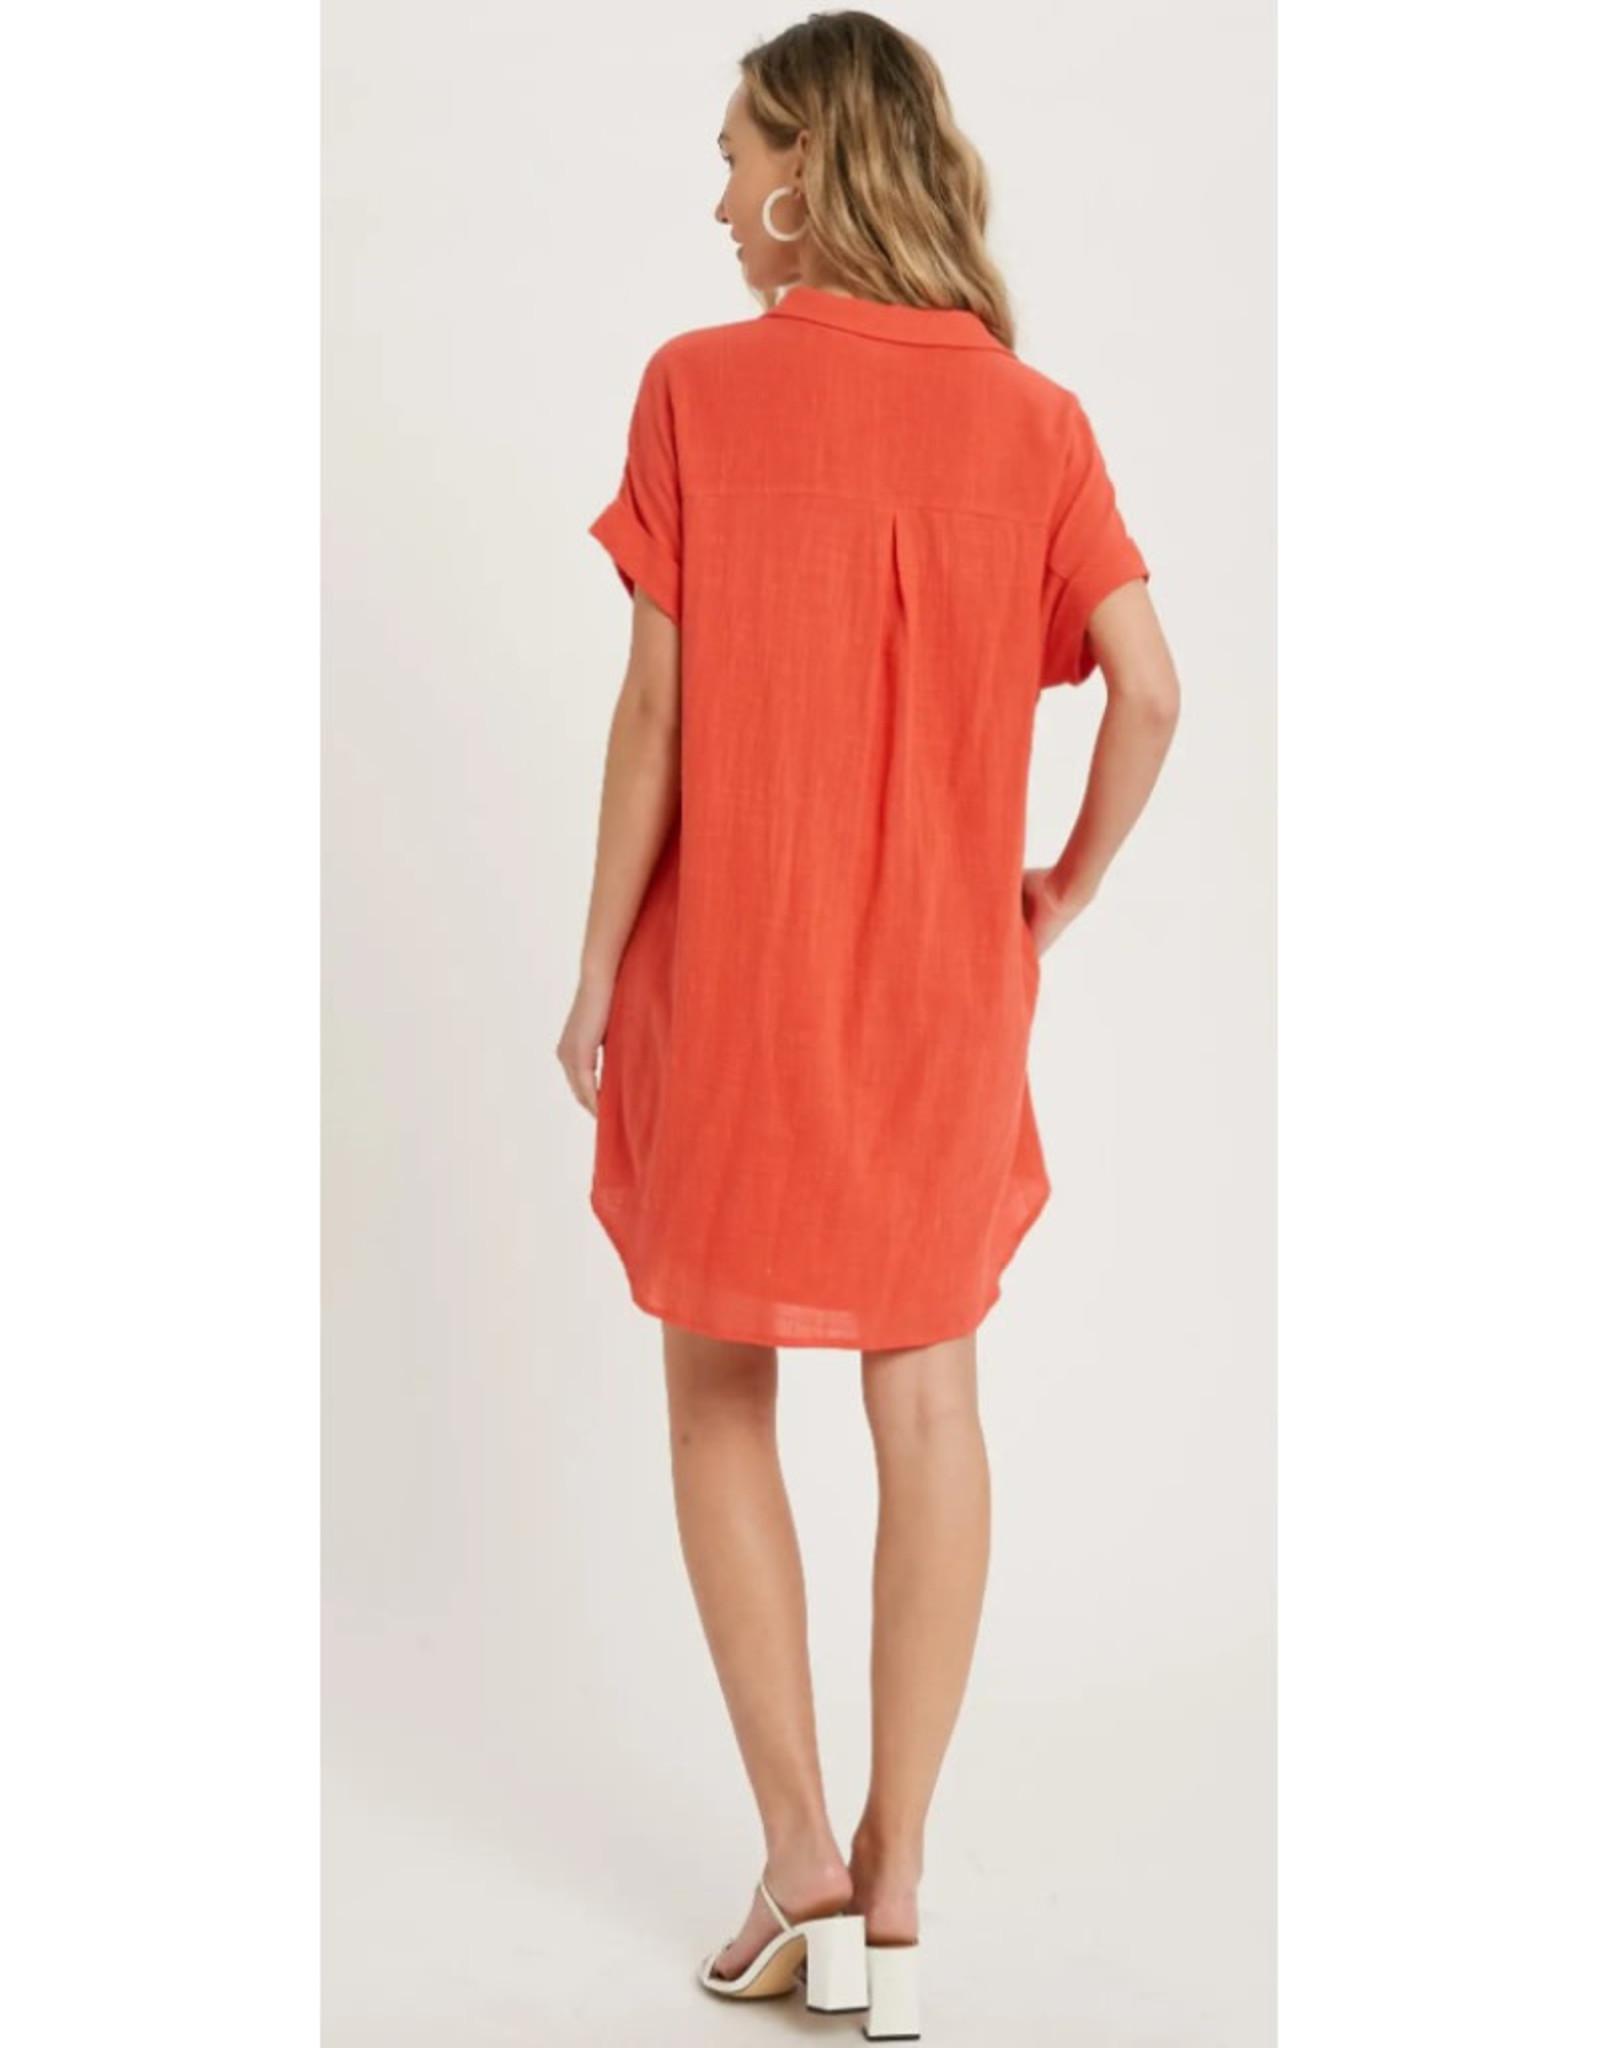 Button Up Shirt Dress with Pocket